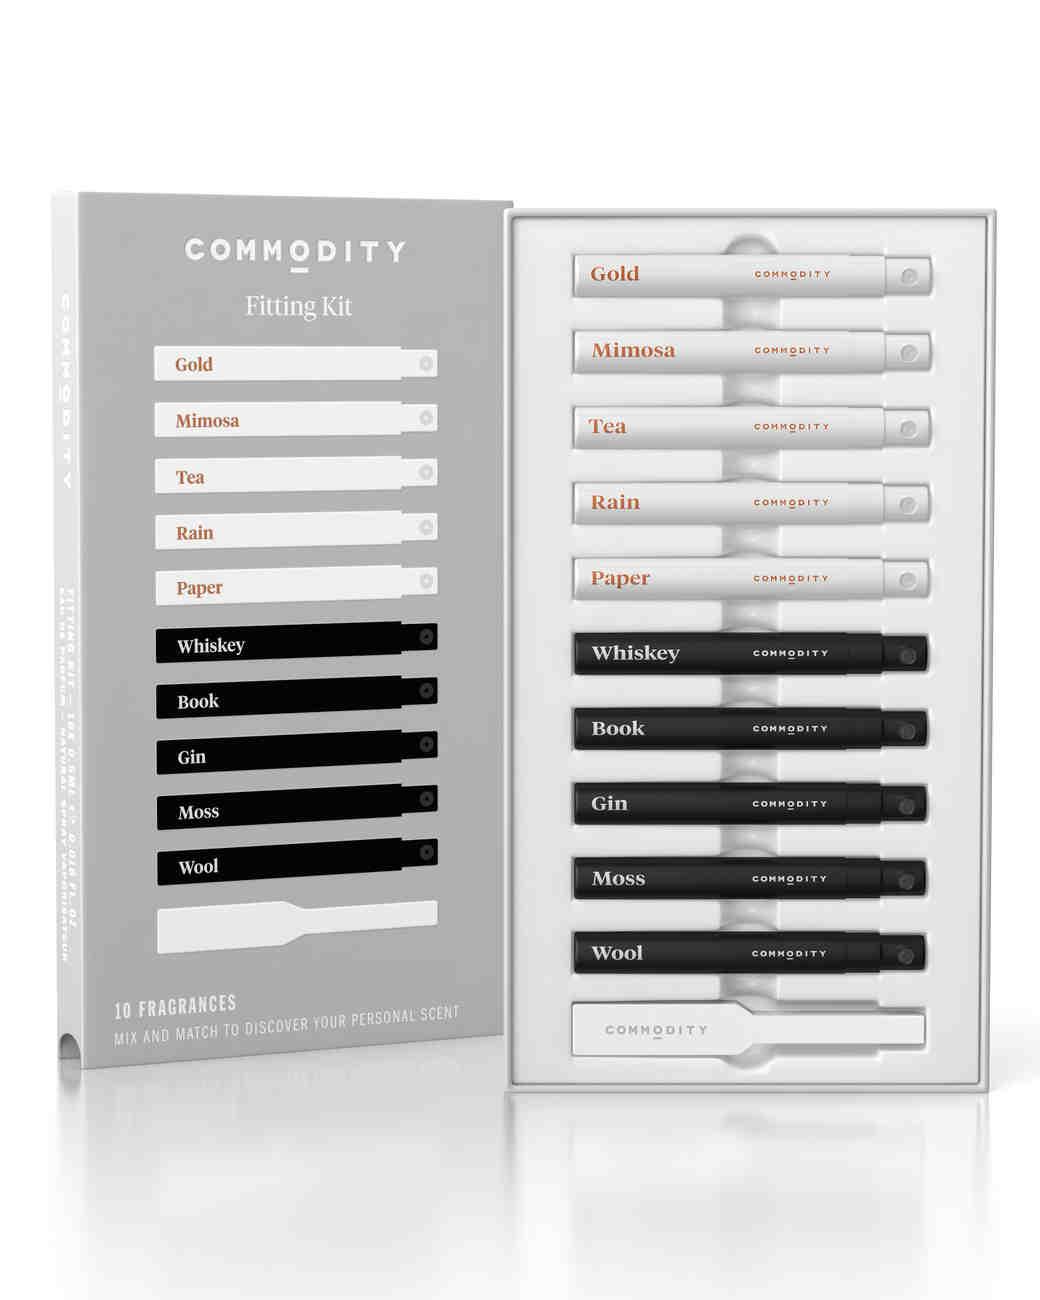 commodity-fitting-kit-1215.jpg